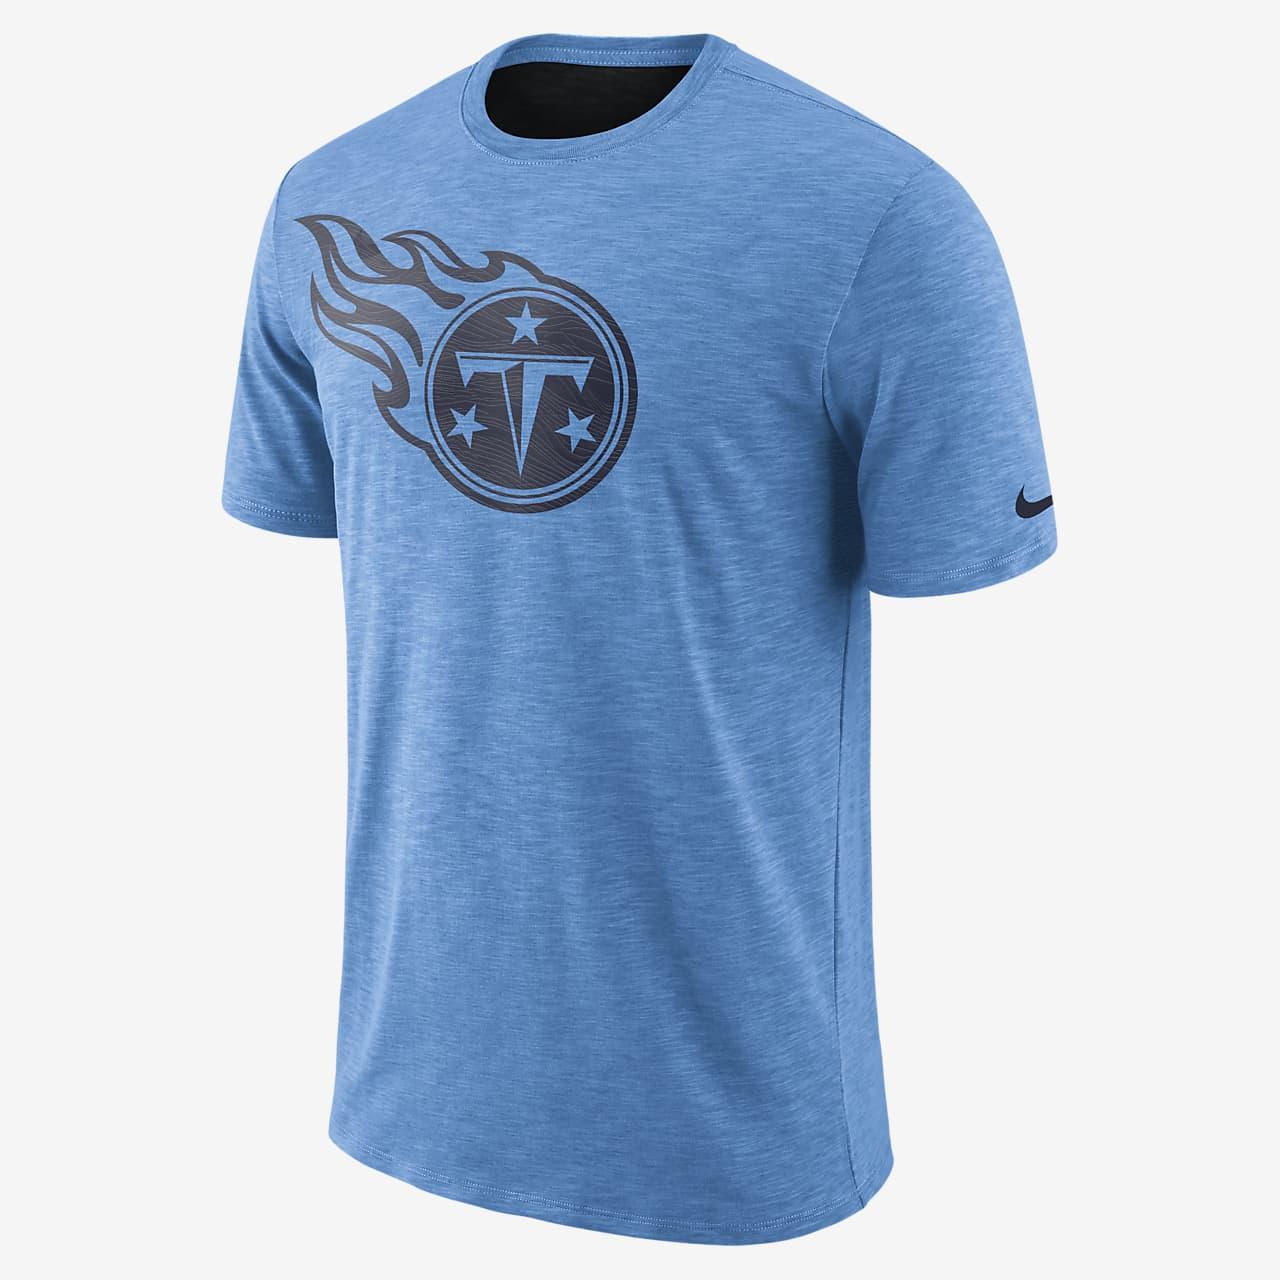 Nike Dri-FIT Legend On-Field (NFL Titans)-T-shirt til mænd